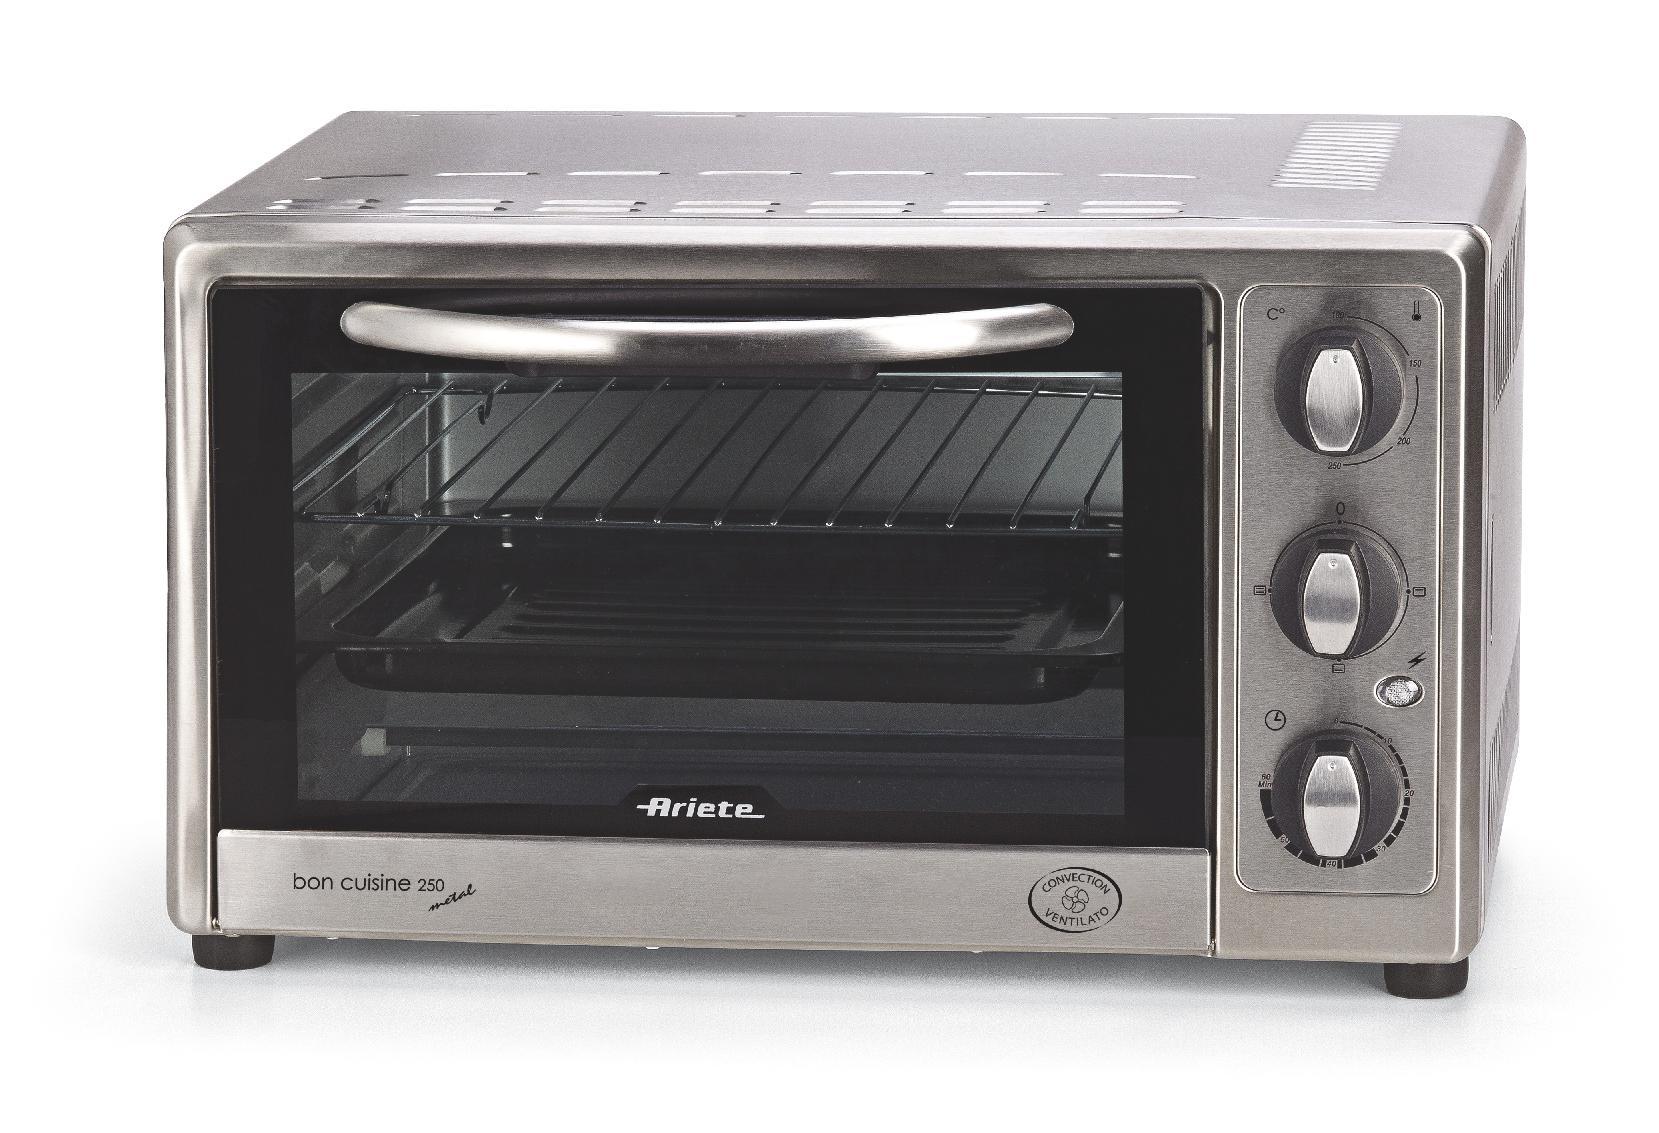 Bon Cuisine 250 Metal - Ariete (EN)